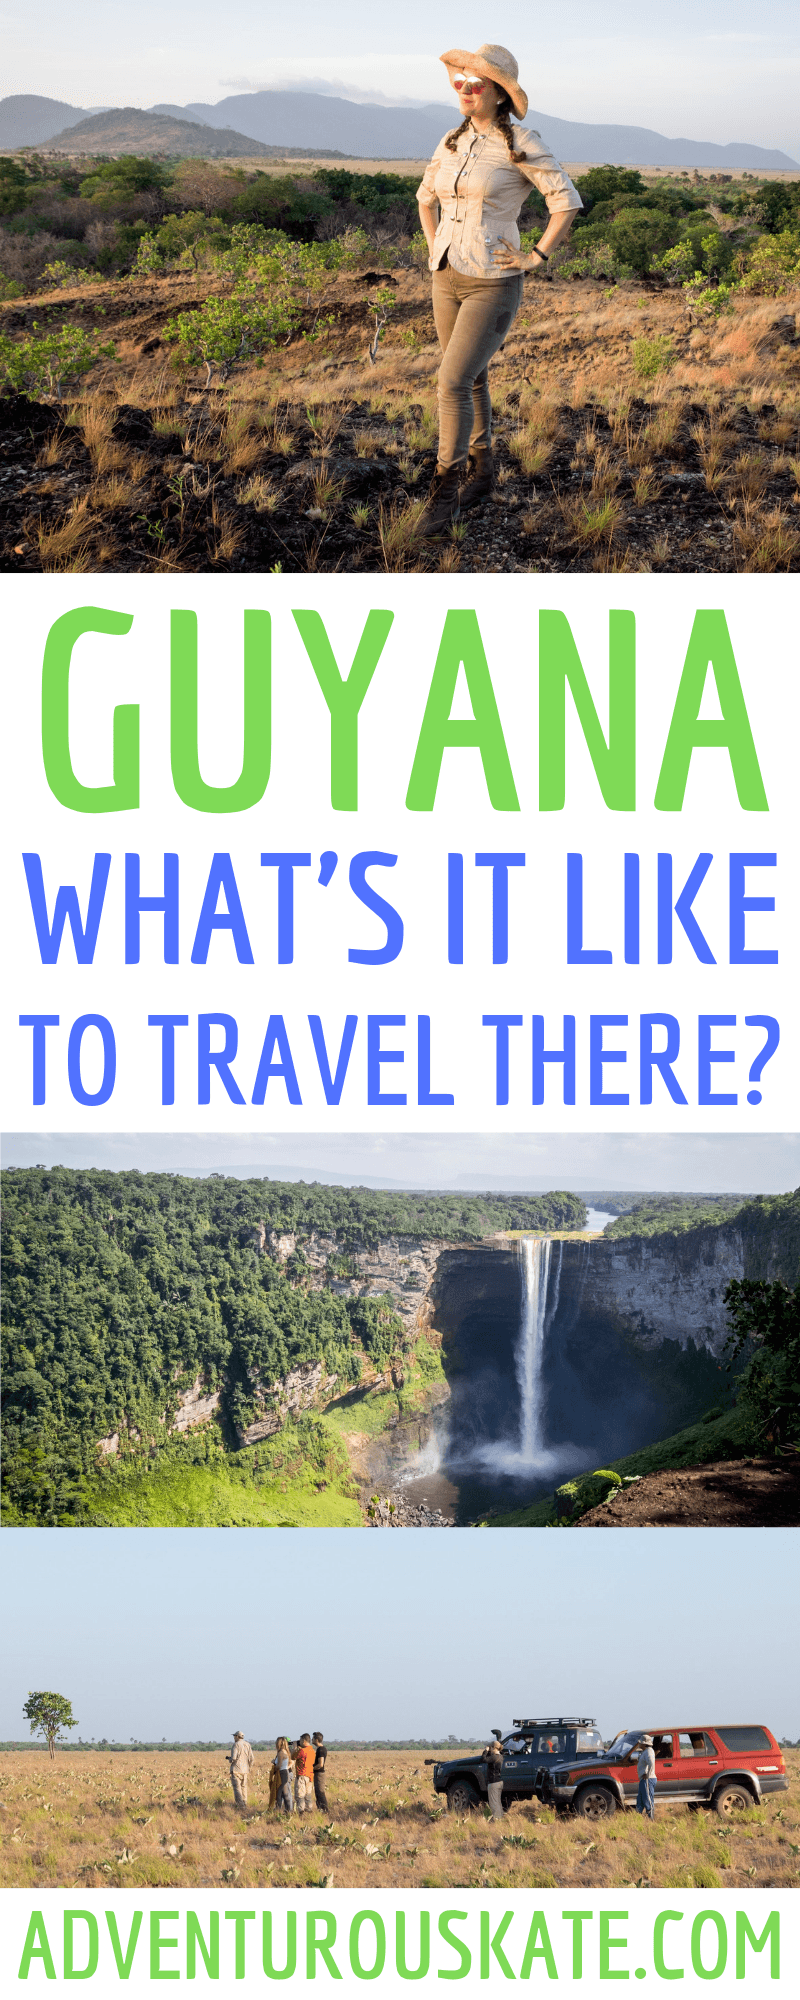 Whats-it-like-to-travel-Guyana ▷ ¿Qué es realmente como viajar a Guyana?